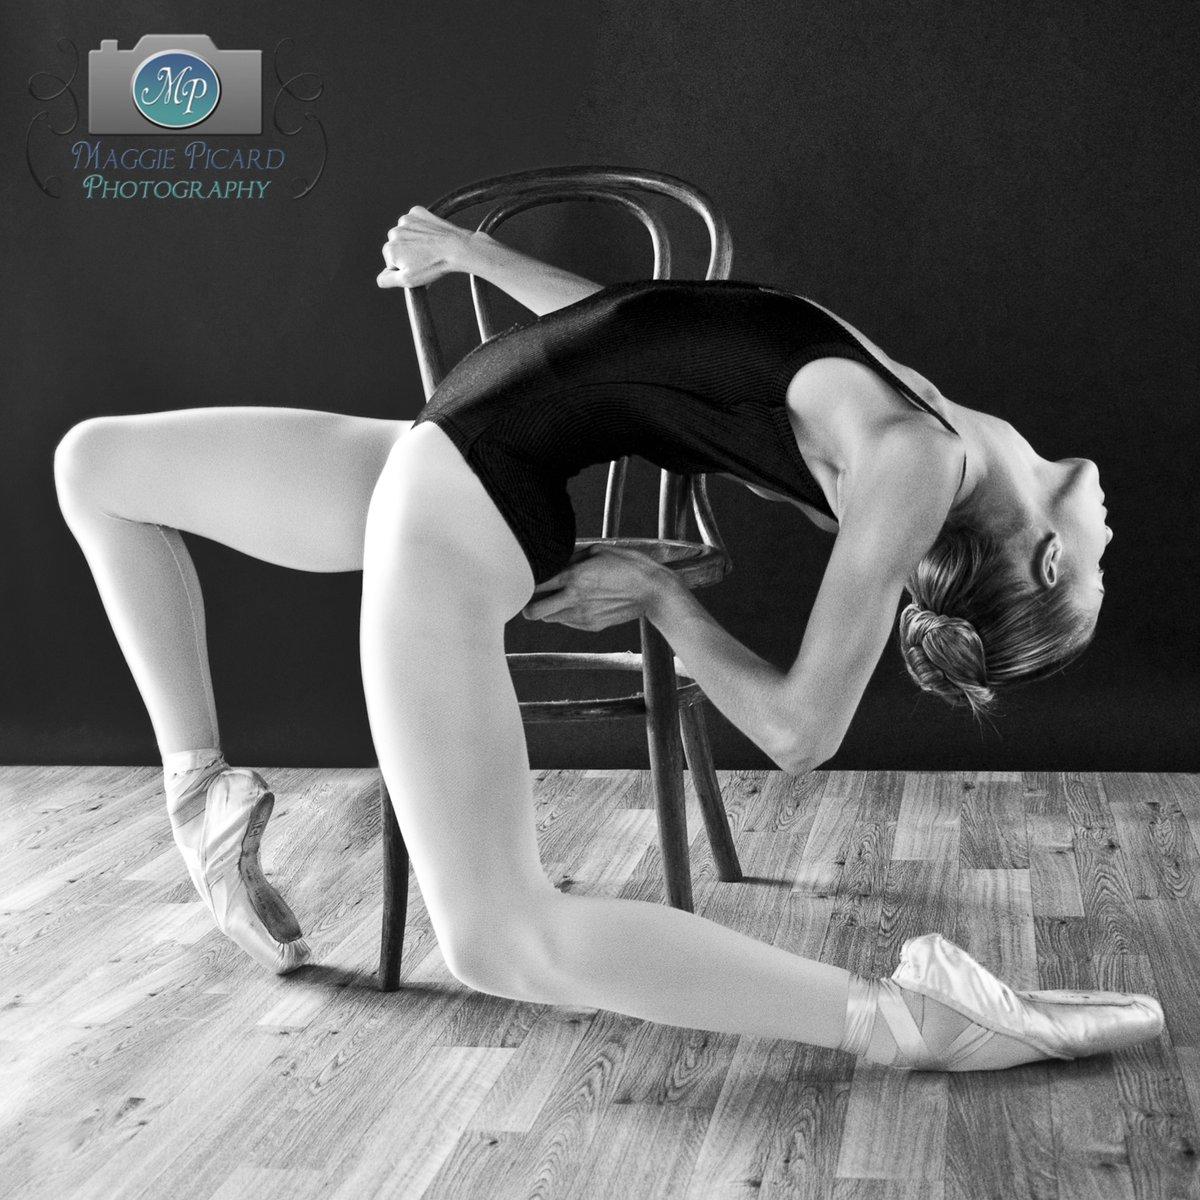 #BalletFascination #Ballet #BalletDancer #BalletPhoto #BalletPost #Posepic.twitter.com/Ds87ifQMFQ